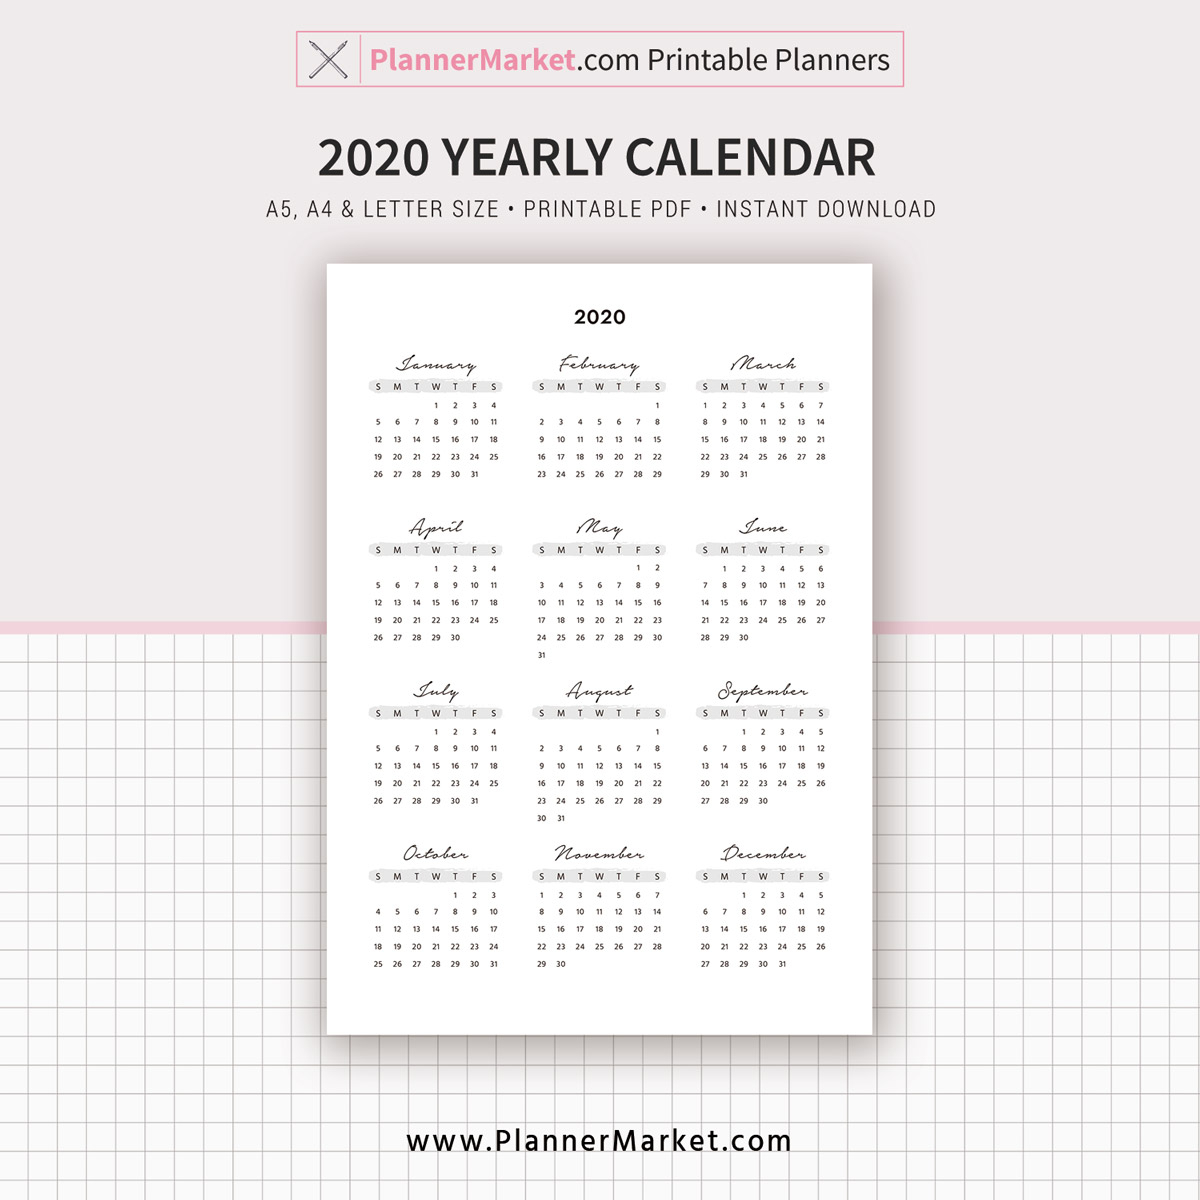 2021 4 4 5 Calendar Quarters – Samyysandra Within 4 5 4 Retail Calendar 2021